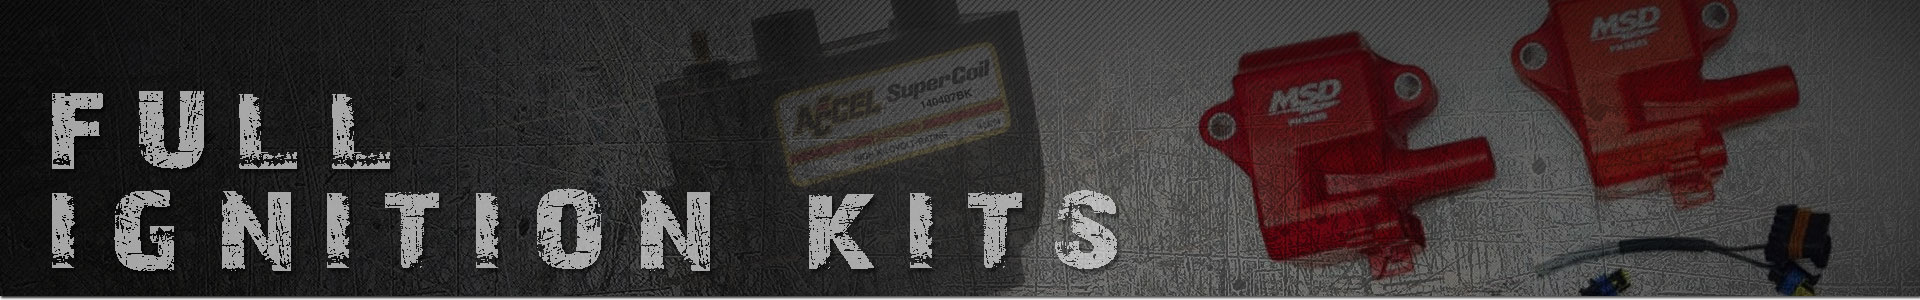 Full Ignition Kits